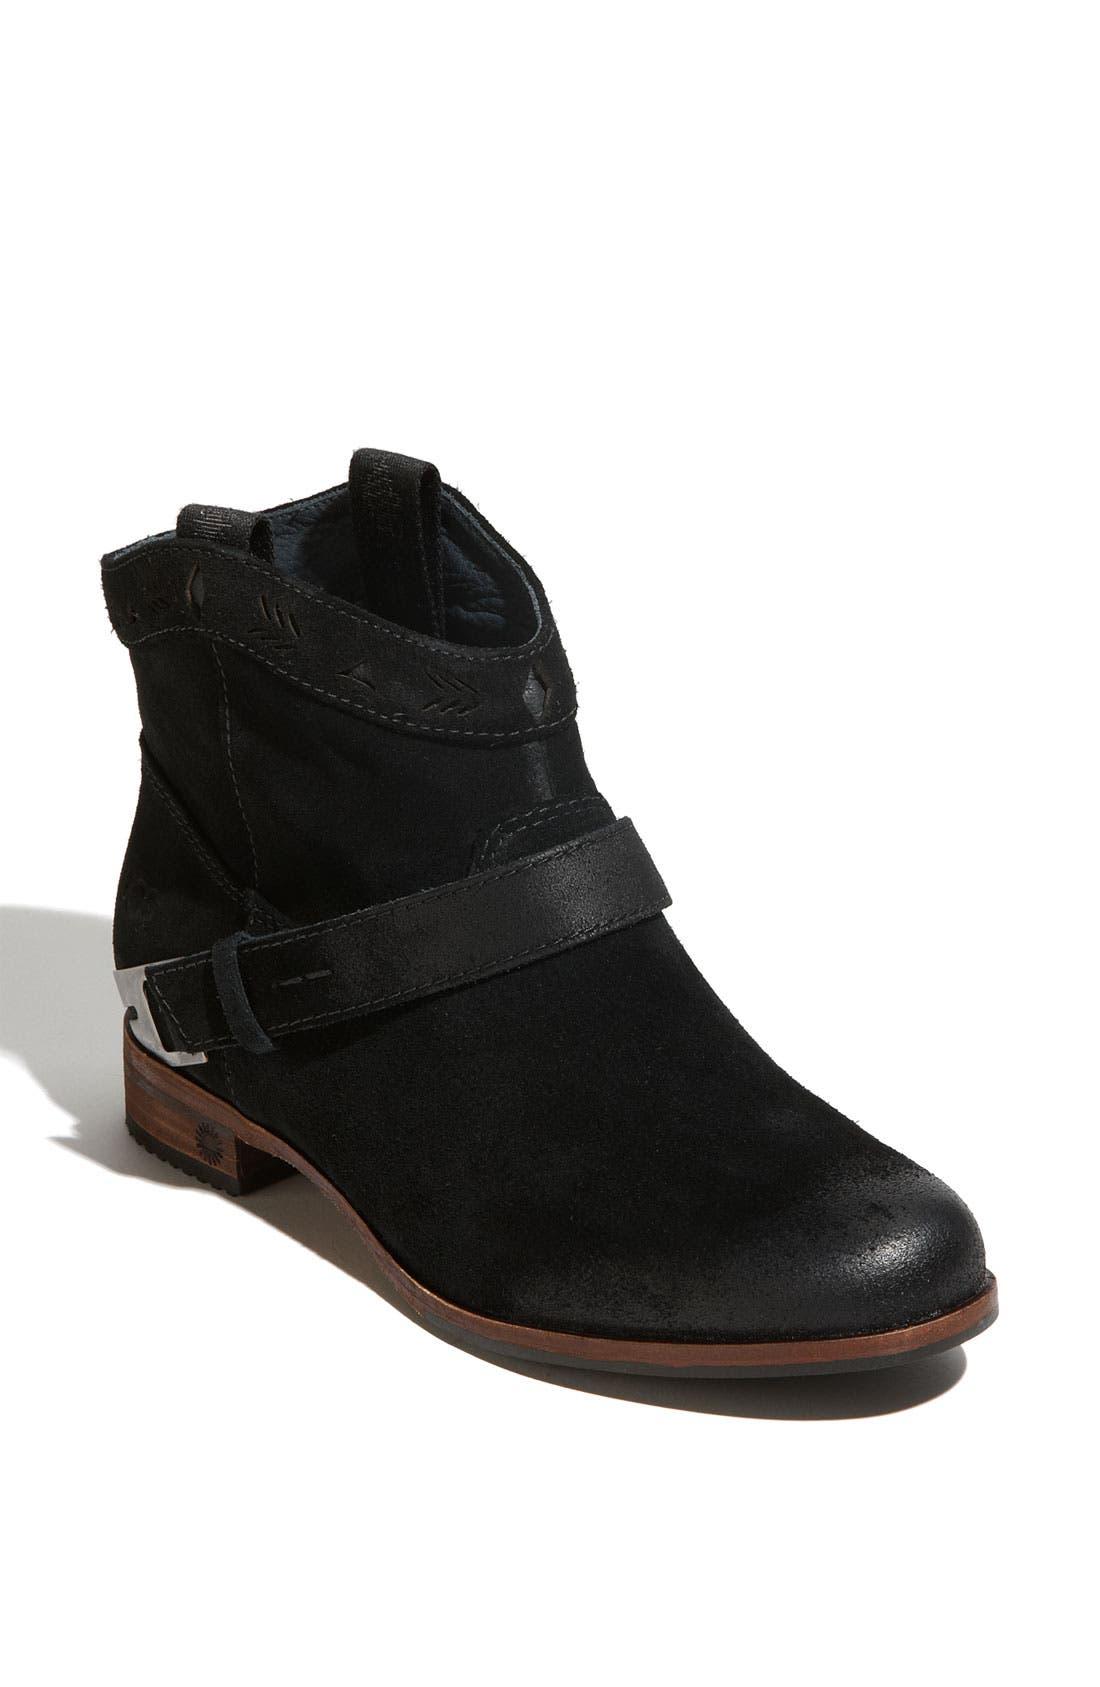 Australia 'Austin' Ankle Boot,                             Main thumbnail 1, color,                             001